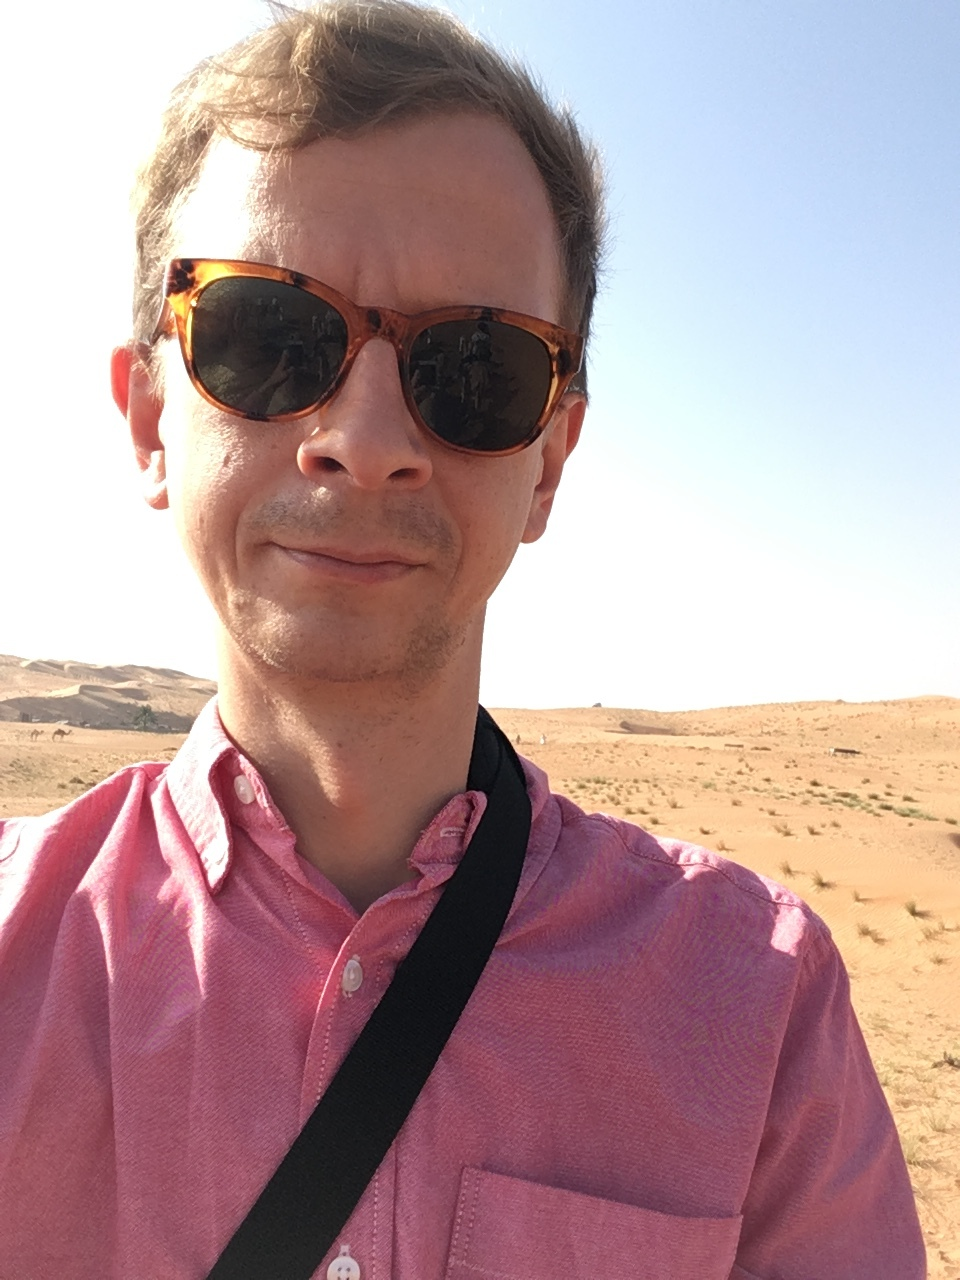 Paul Czodrowski - since September 2018: TU DortmundDepartment Chemistry & Chemical BiologyAssociate Professor